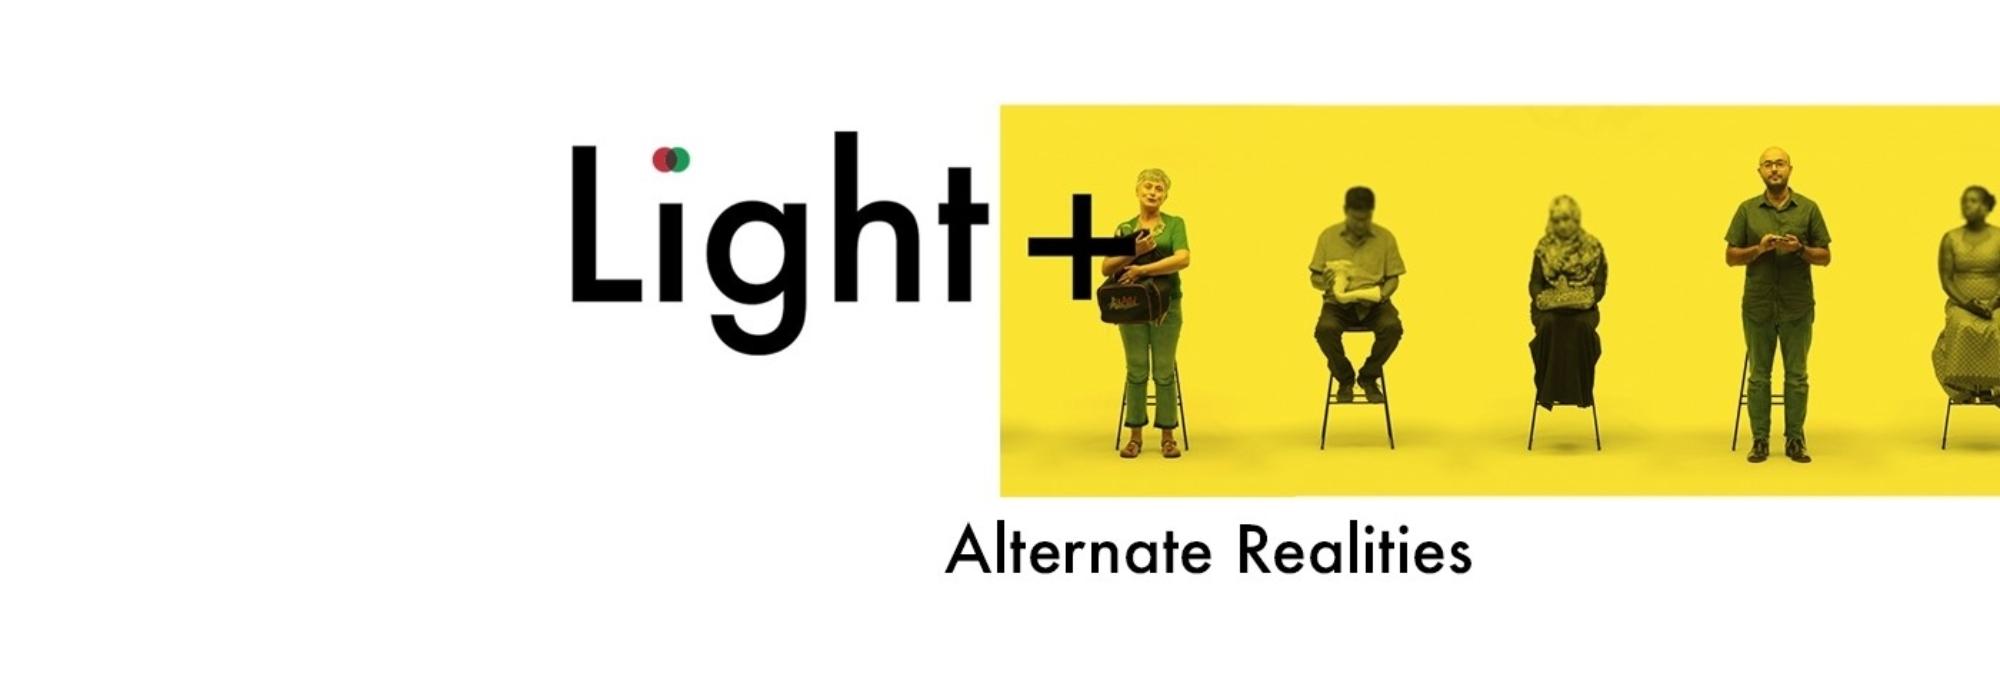 Light+ Alternate Realities